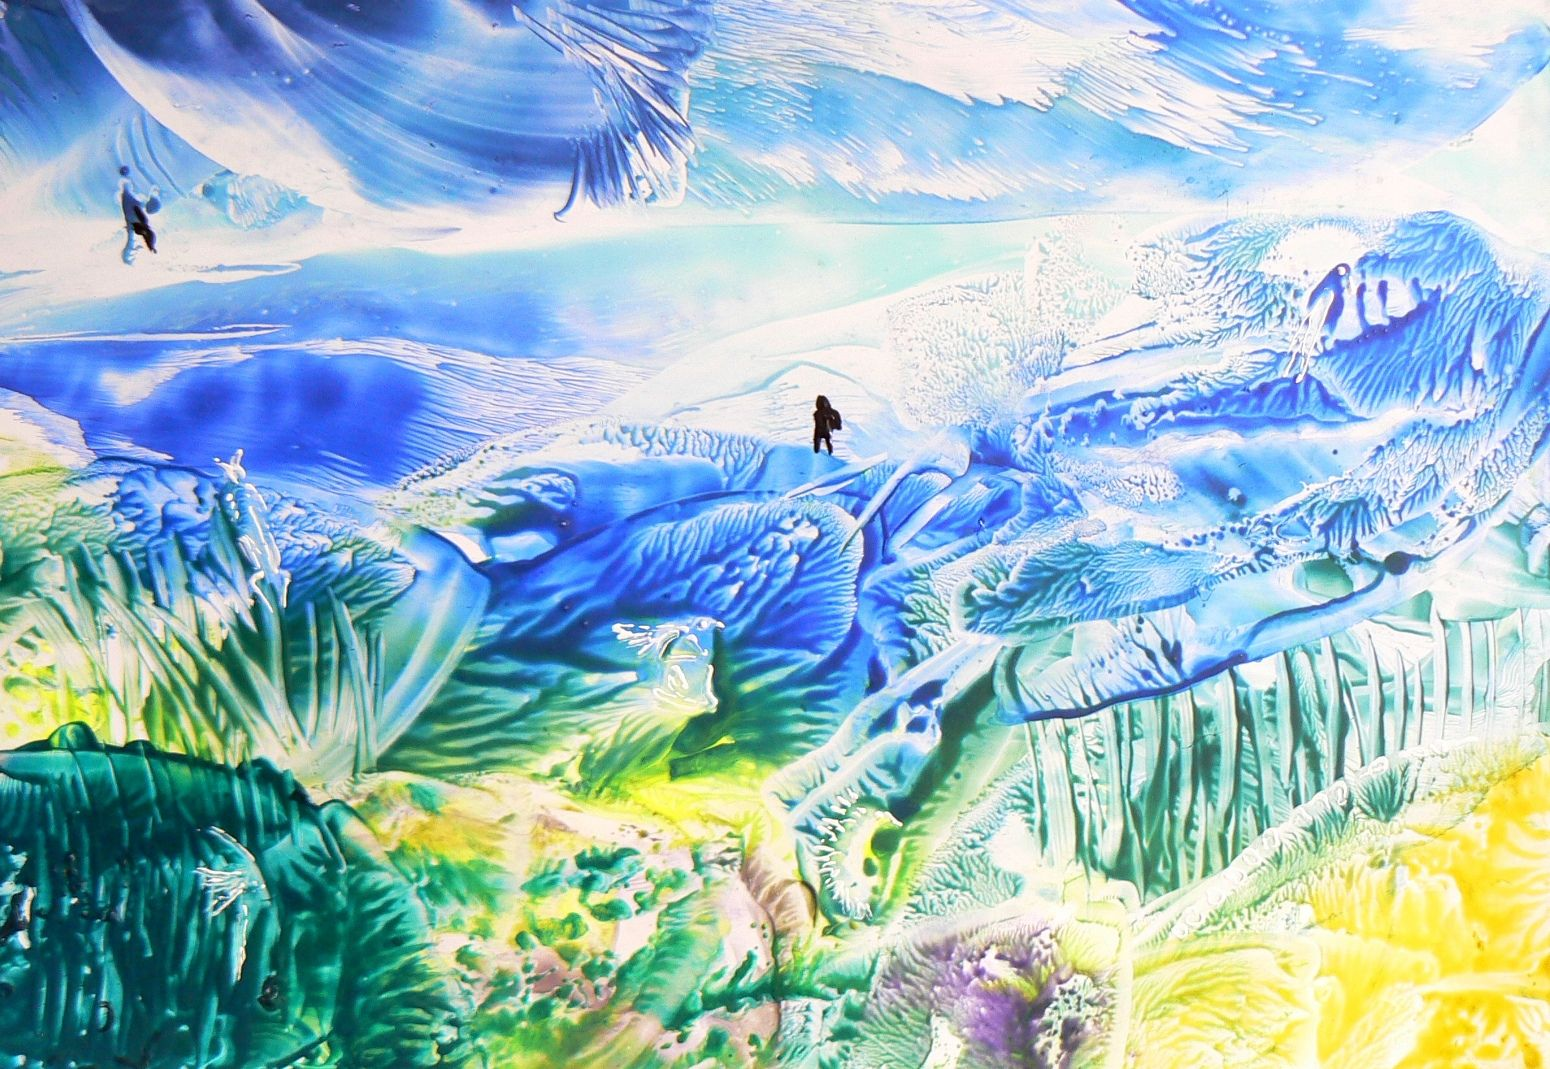 Gerard van Velzen - Daydreamer #8   Kunstwerk